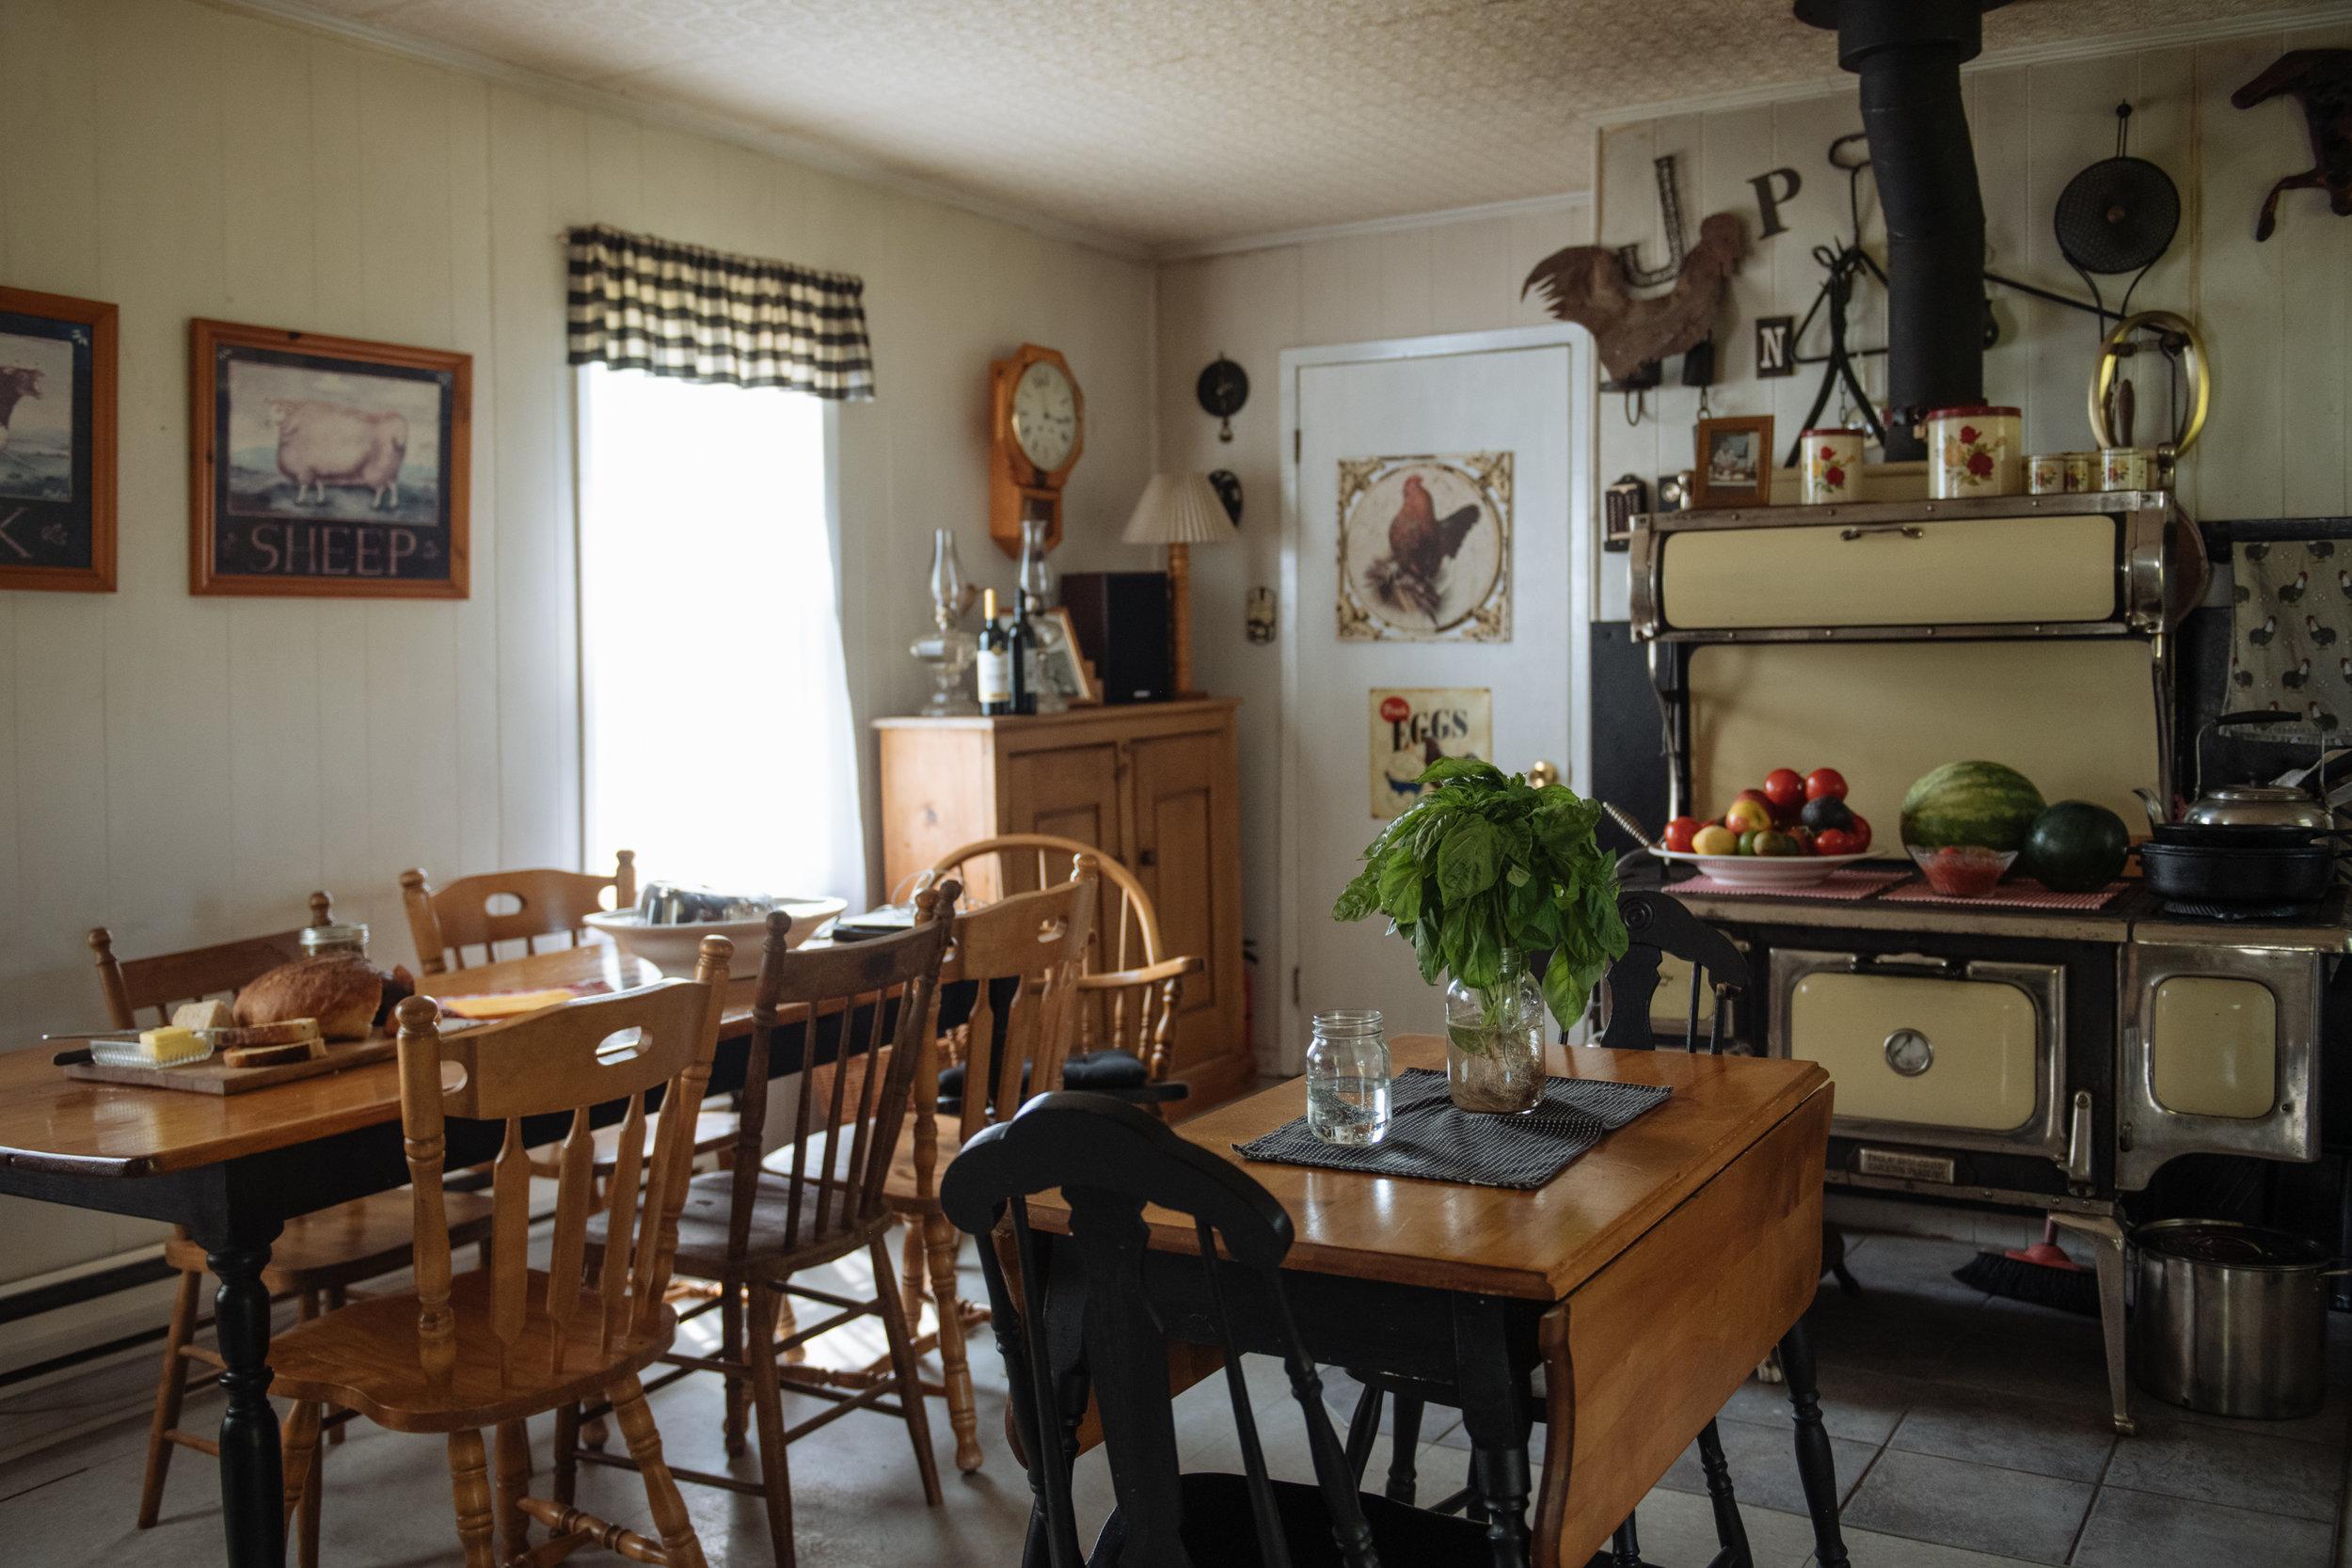 Rodan-Farmhouse-070719-220.jpg